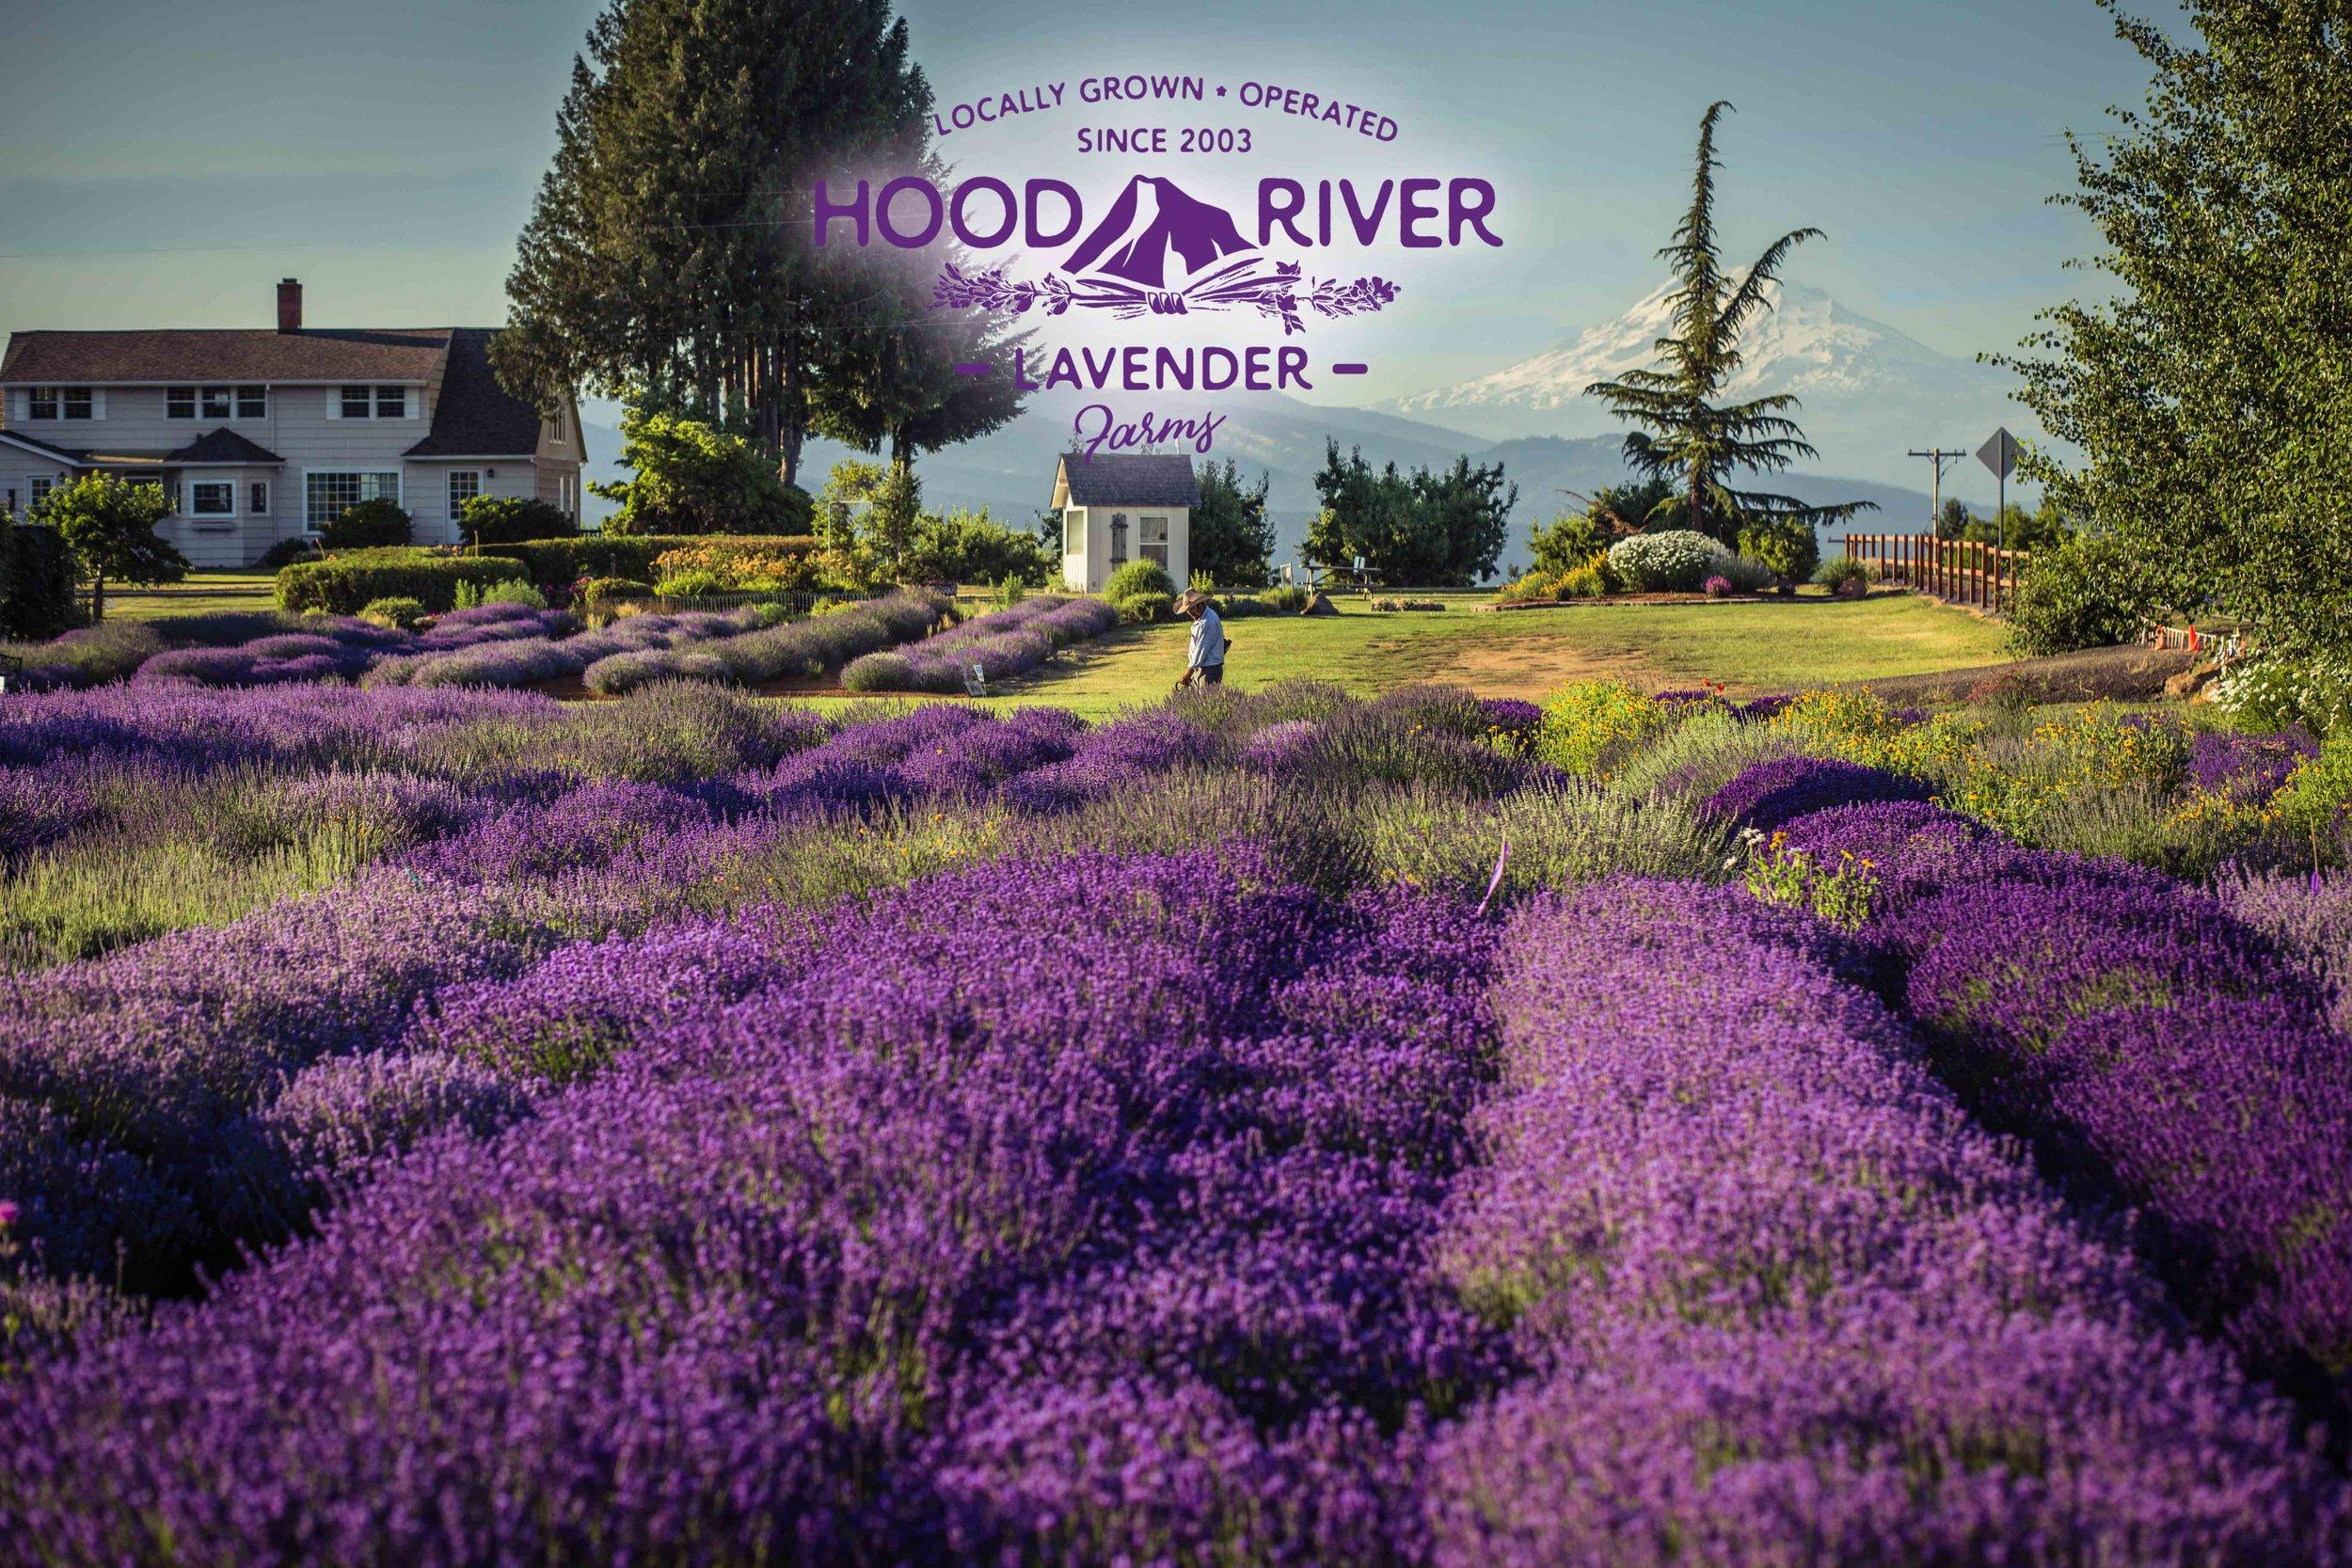 Hood River Lavender Farms 7Columbia Gorge buy lavender online hood river odell portland pacific northwest pnw creams lavender_-17.jpg